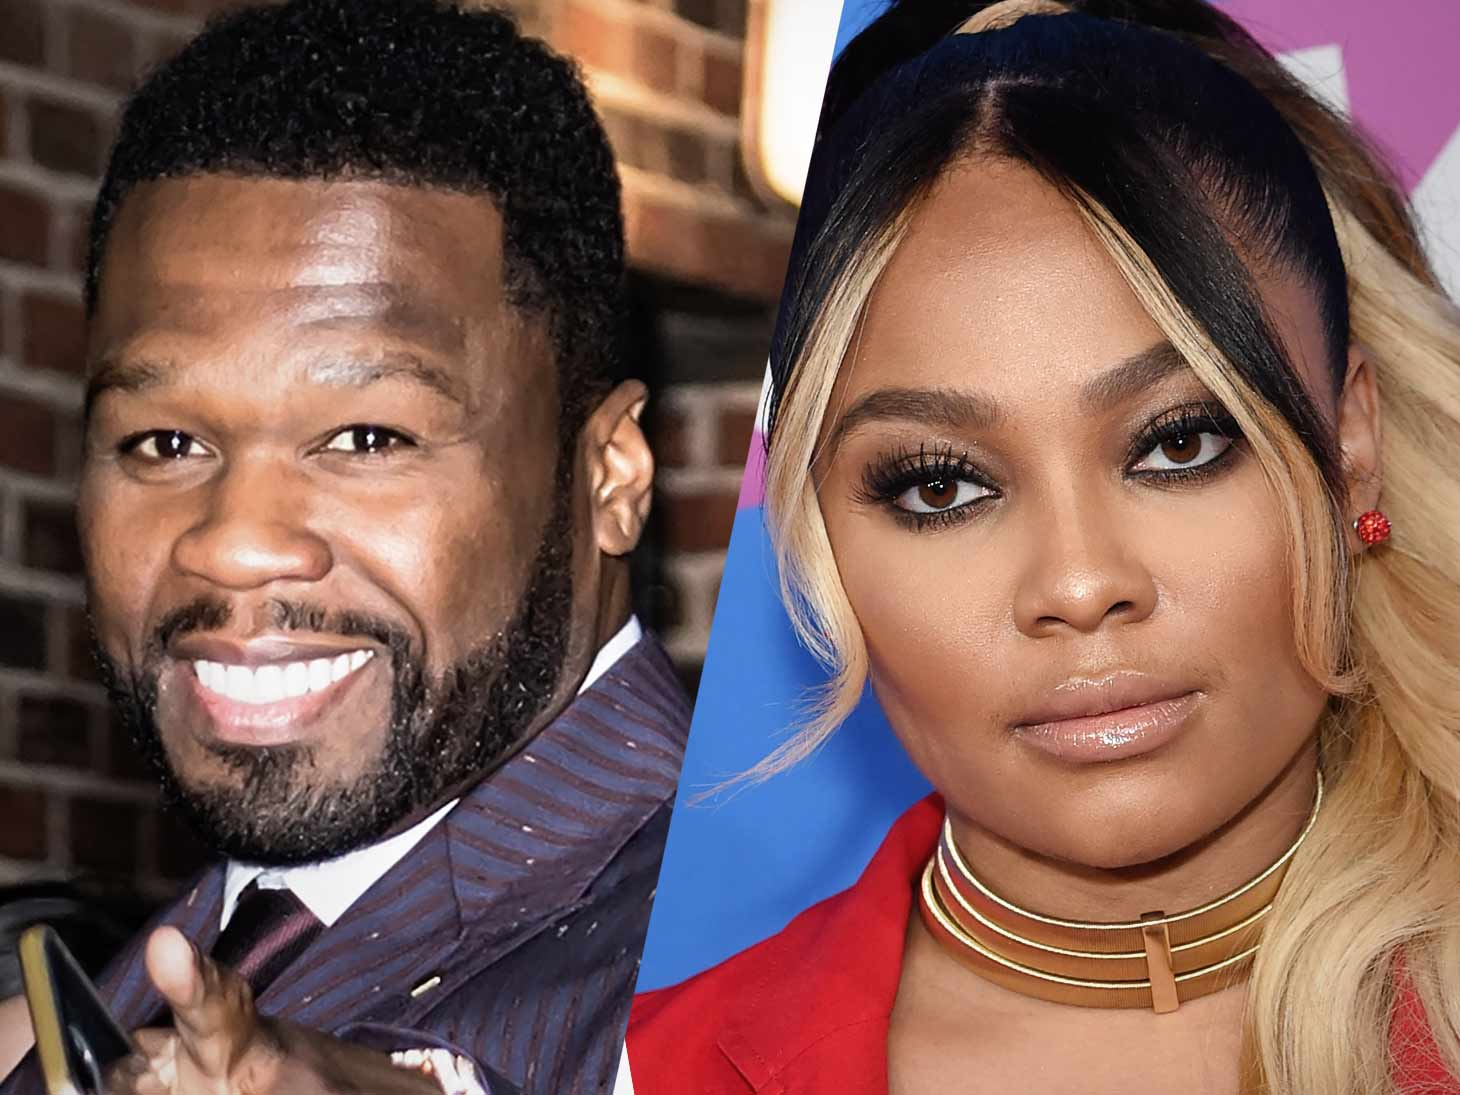 50 Cent and Teairra Mari